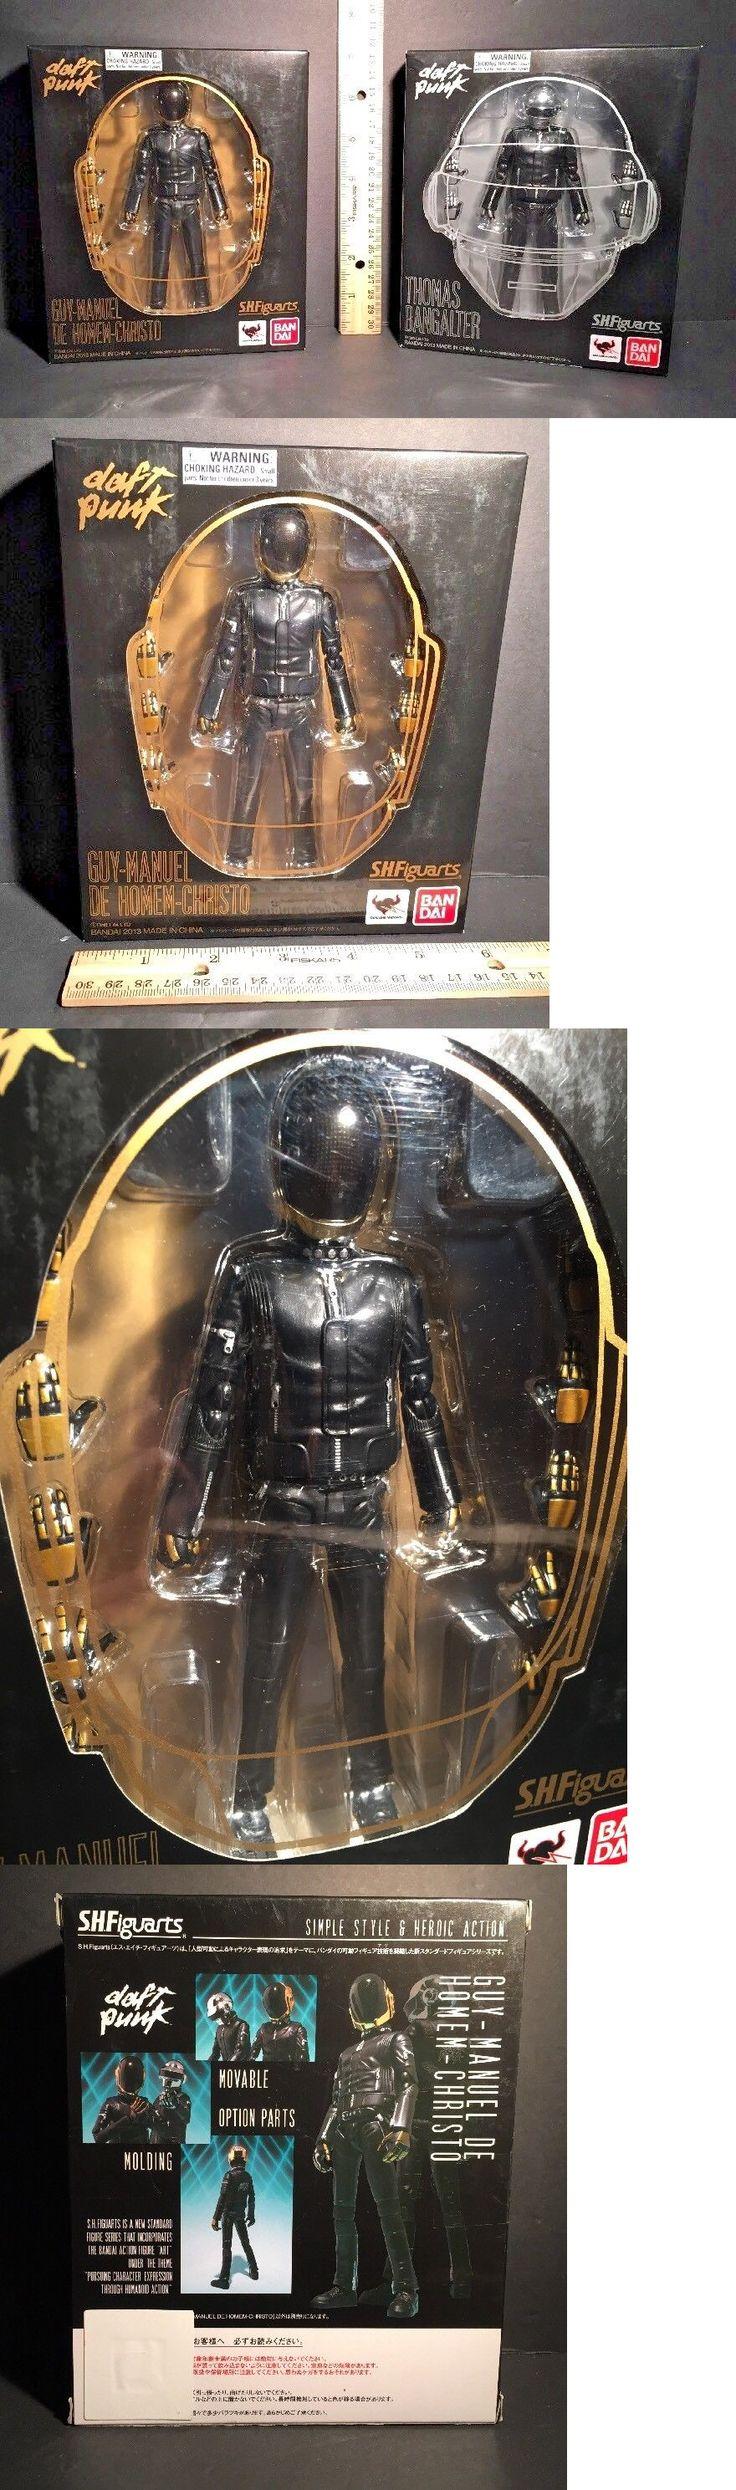 Music 175691: Daft Punk 6 Guy-Manuel De Homem-Christo And Thomas Bangalter Figures Lot Of 2 Nib -> BUY IT NOW ONLY: $249.95 on eBay!